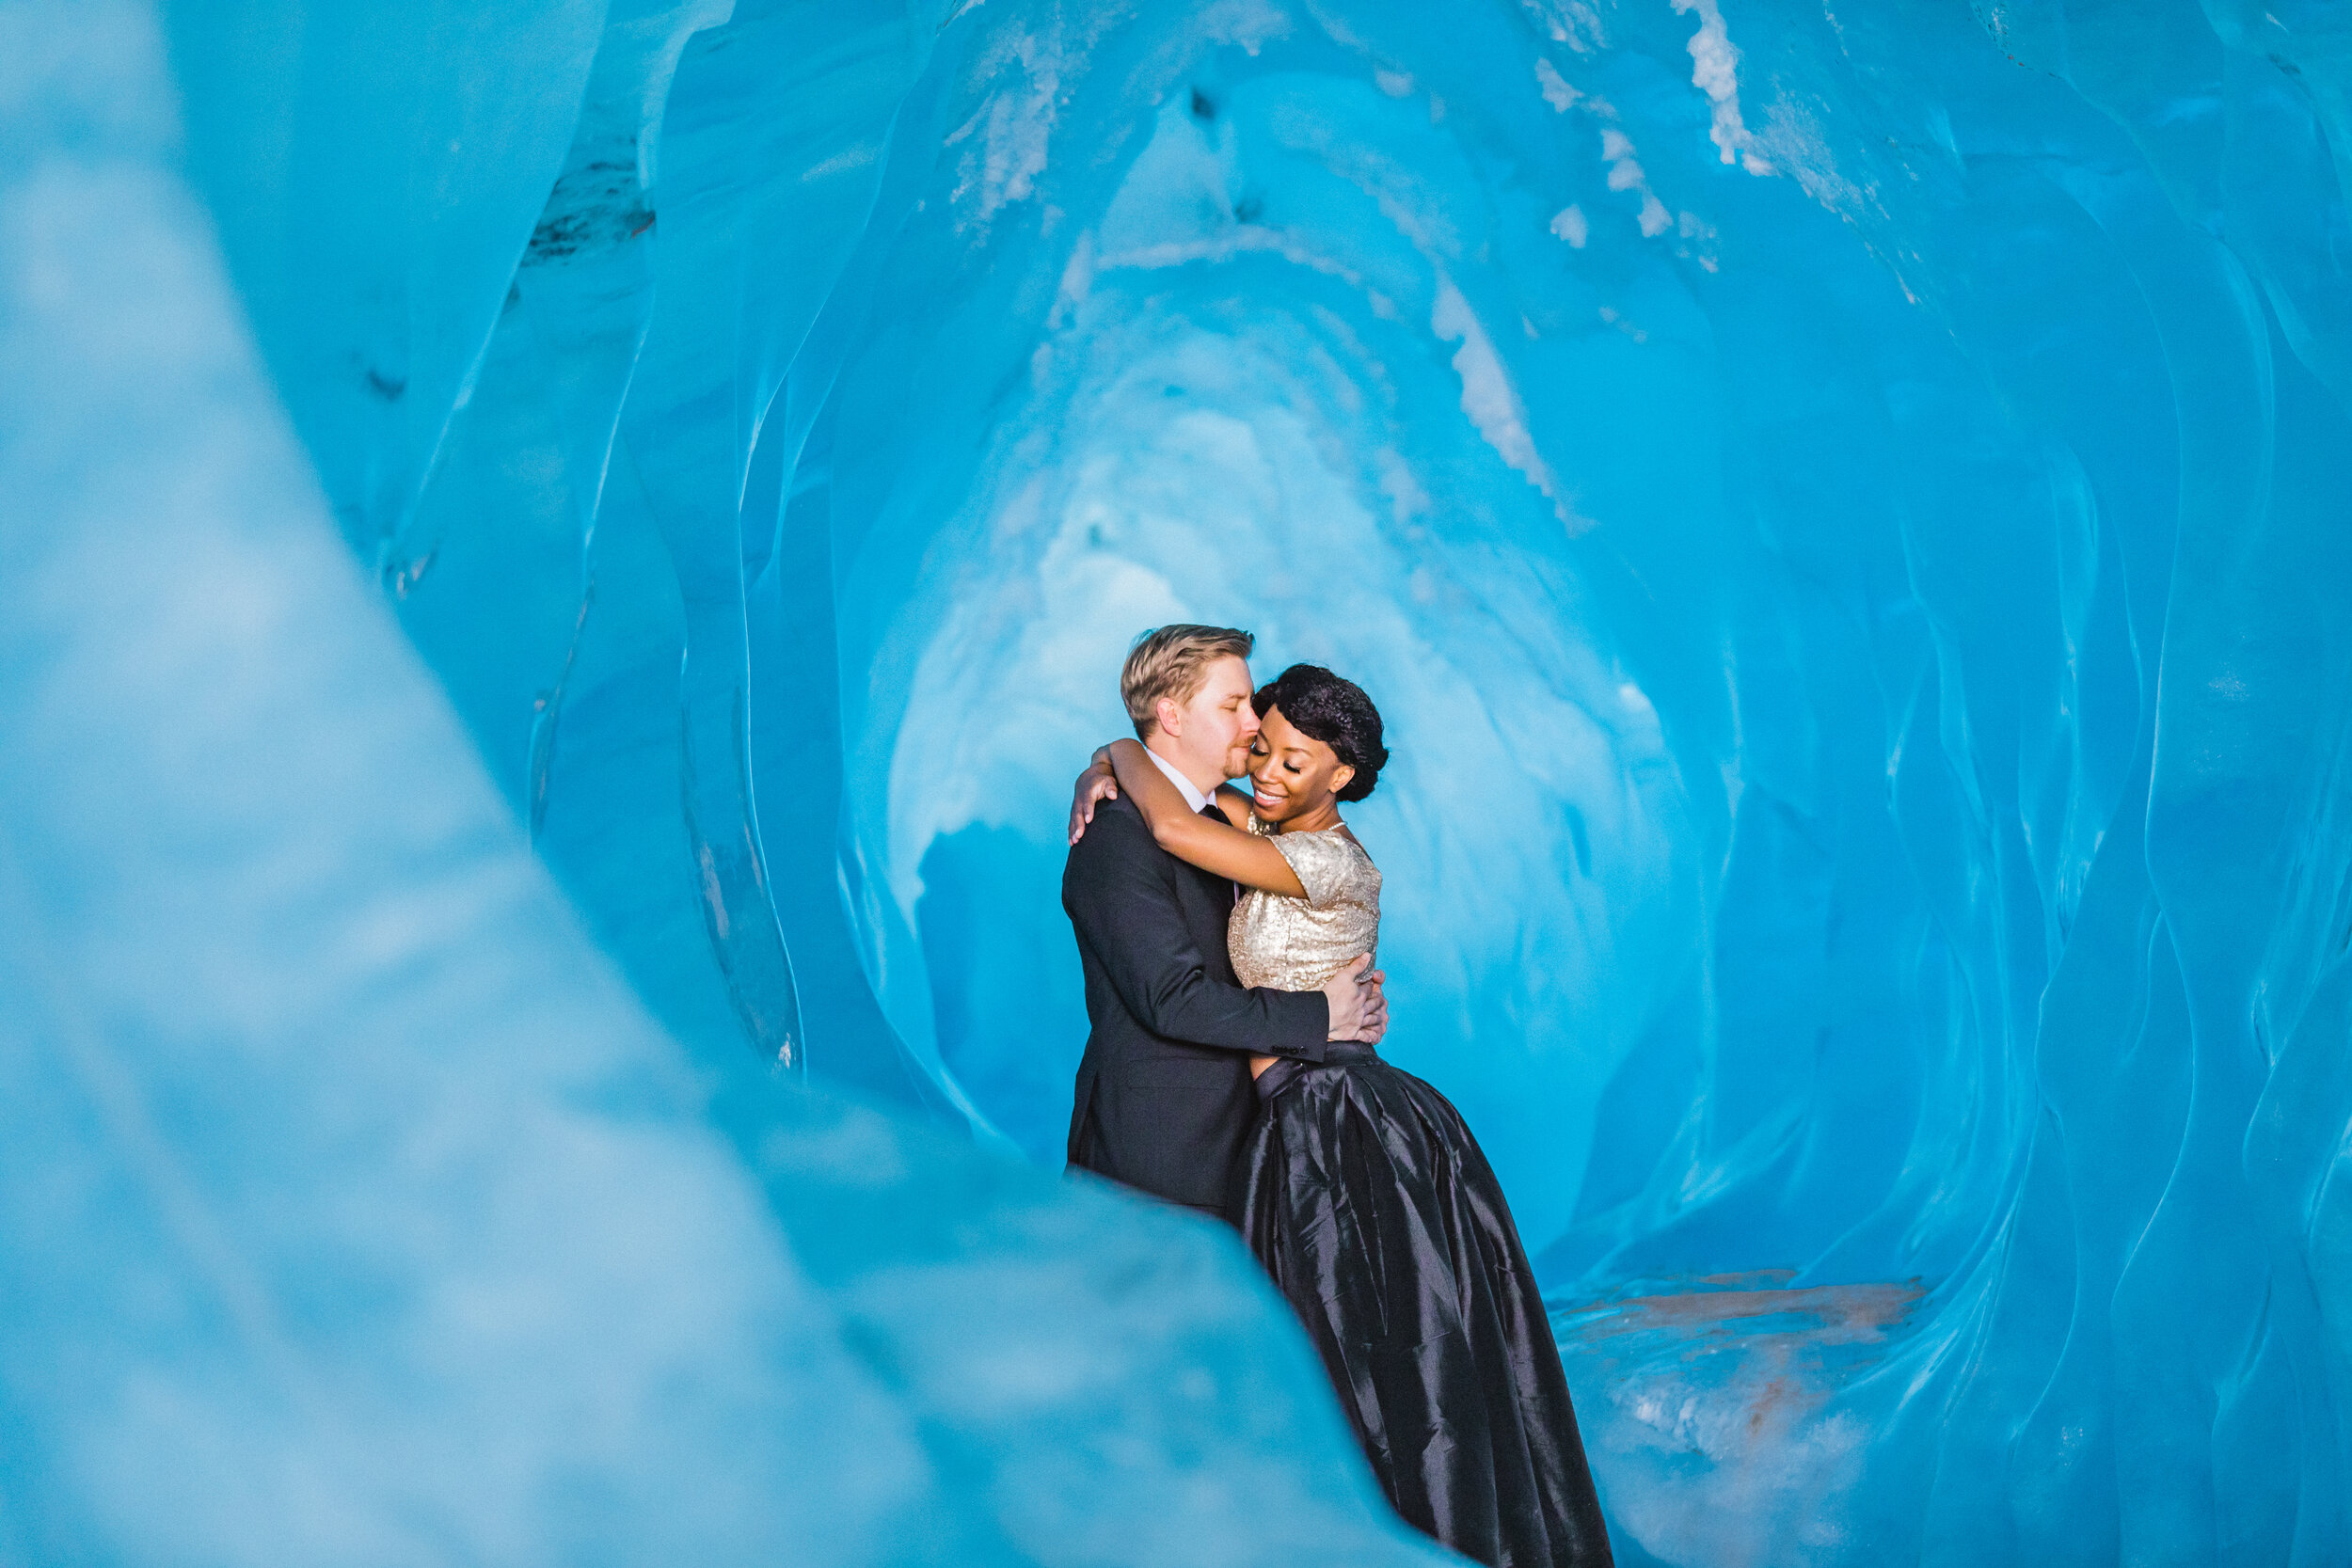 Engagement_Session_Matanuska_Glacier_Alaska_Emily_Lester_Photography-90.jpg